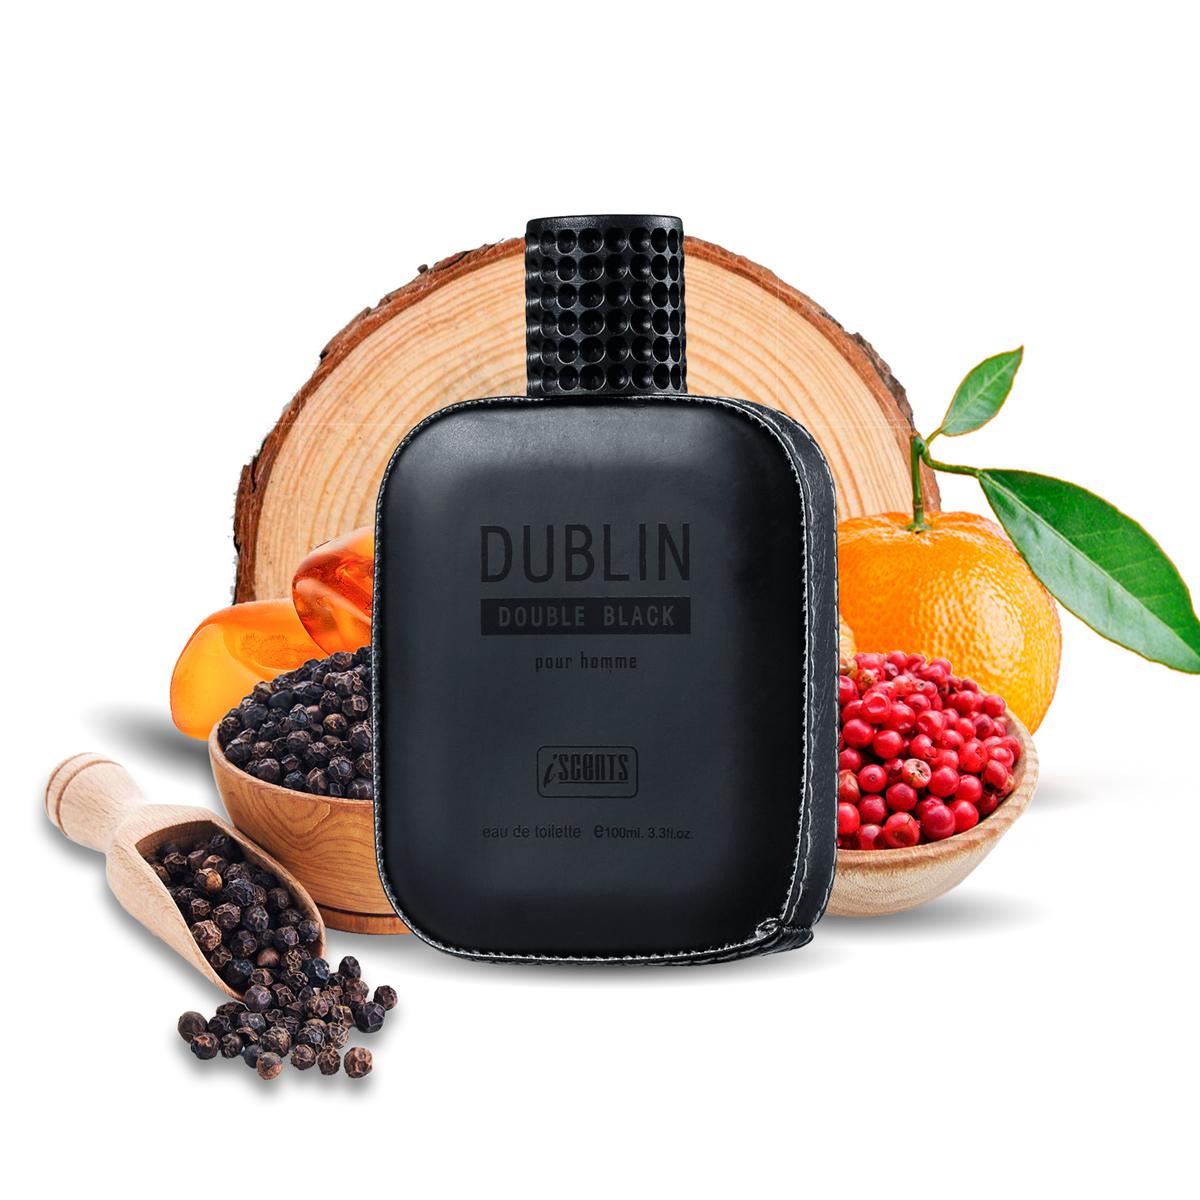 Perfume Dublin Masculino Edt 100ml - I Scents